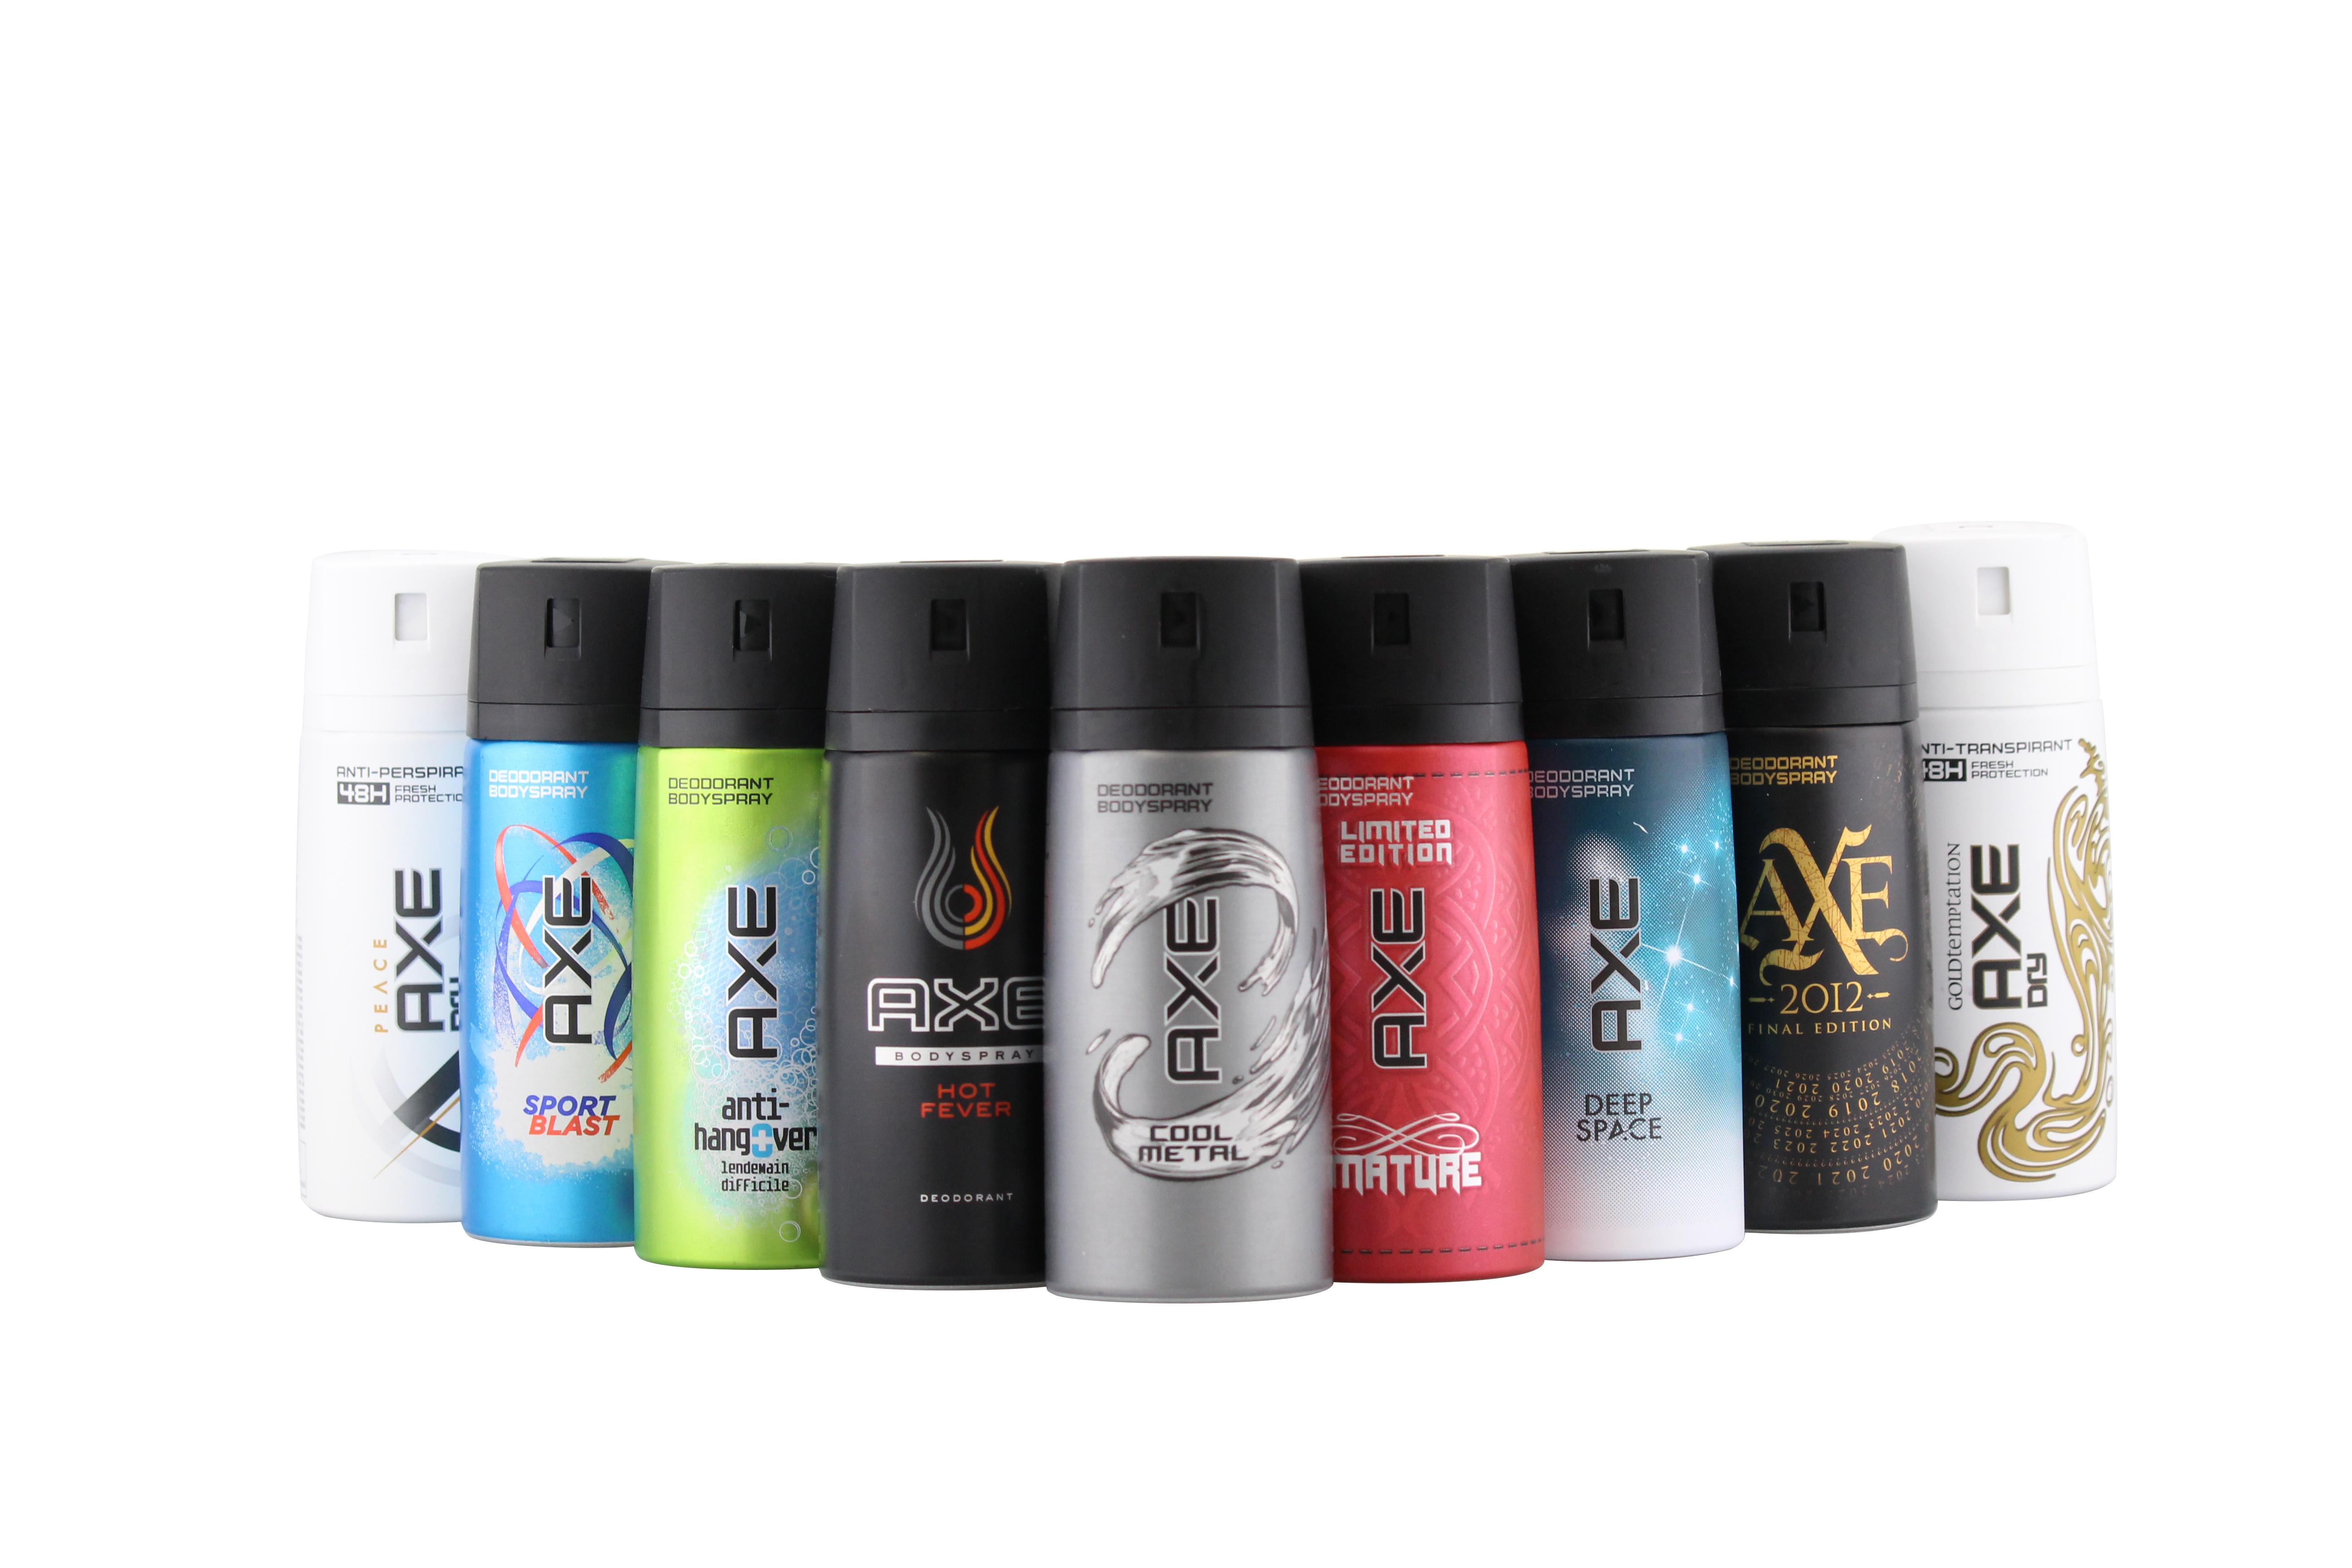 Axe Deo 6 x150 ml diverse Sorten Deodorant Deospray - verschiedene (1,77€/100ml) | eBay